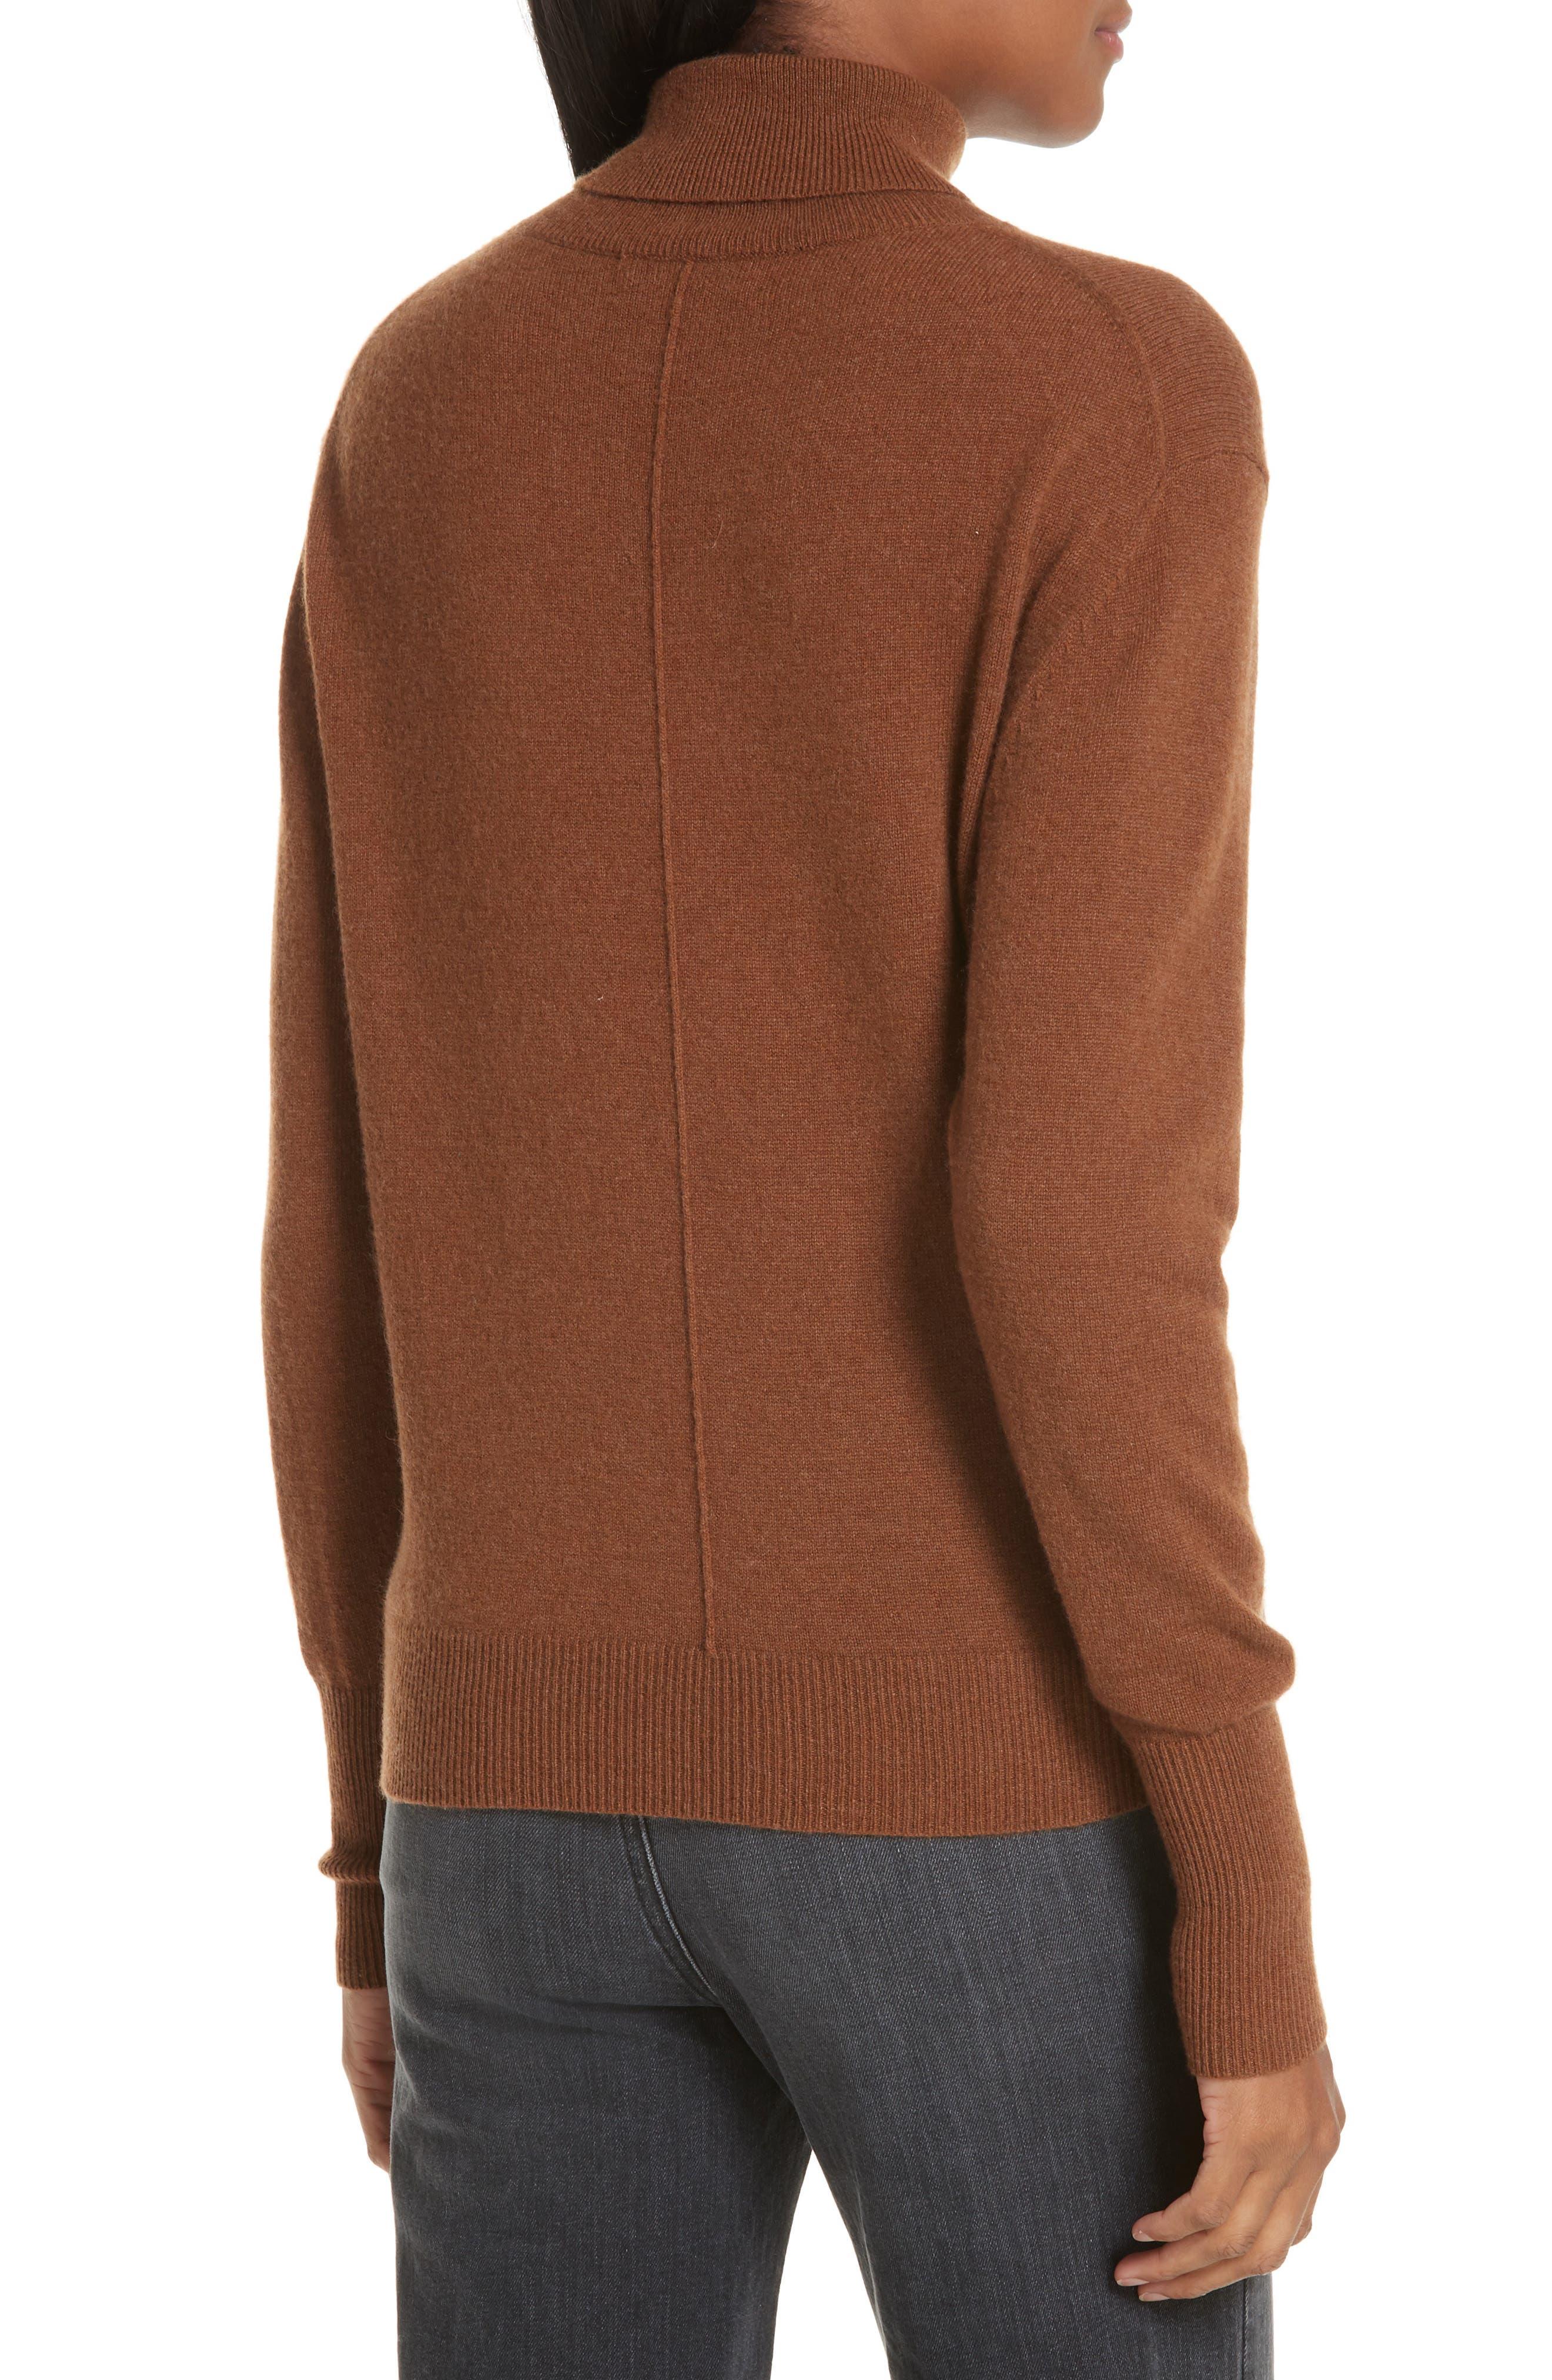 NILI LOTAN, Ralphie Cashmere Turtleneck Sweater, Alternate thumbnail 2, color, COGNAC